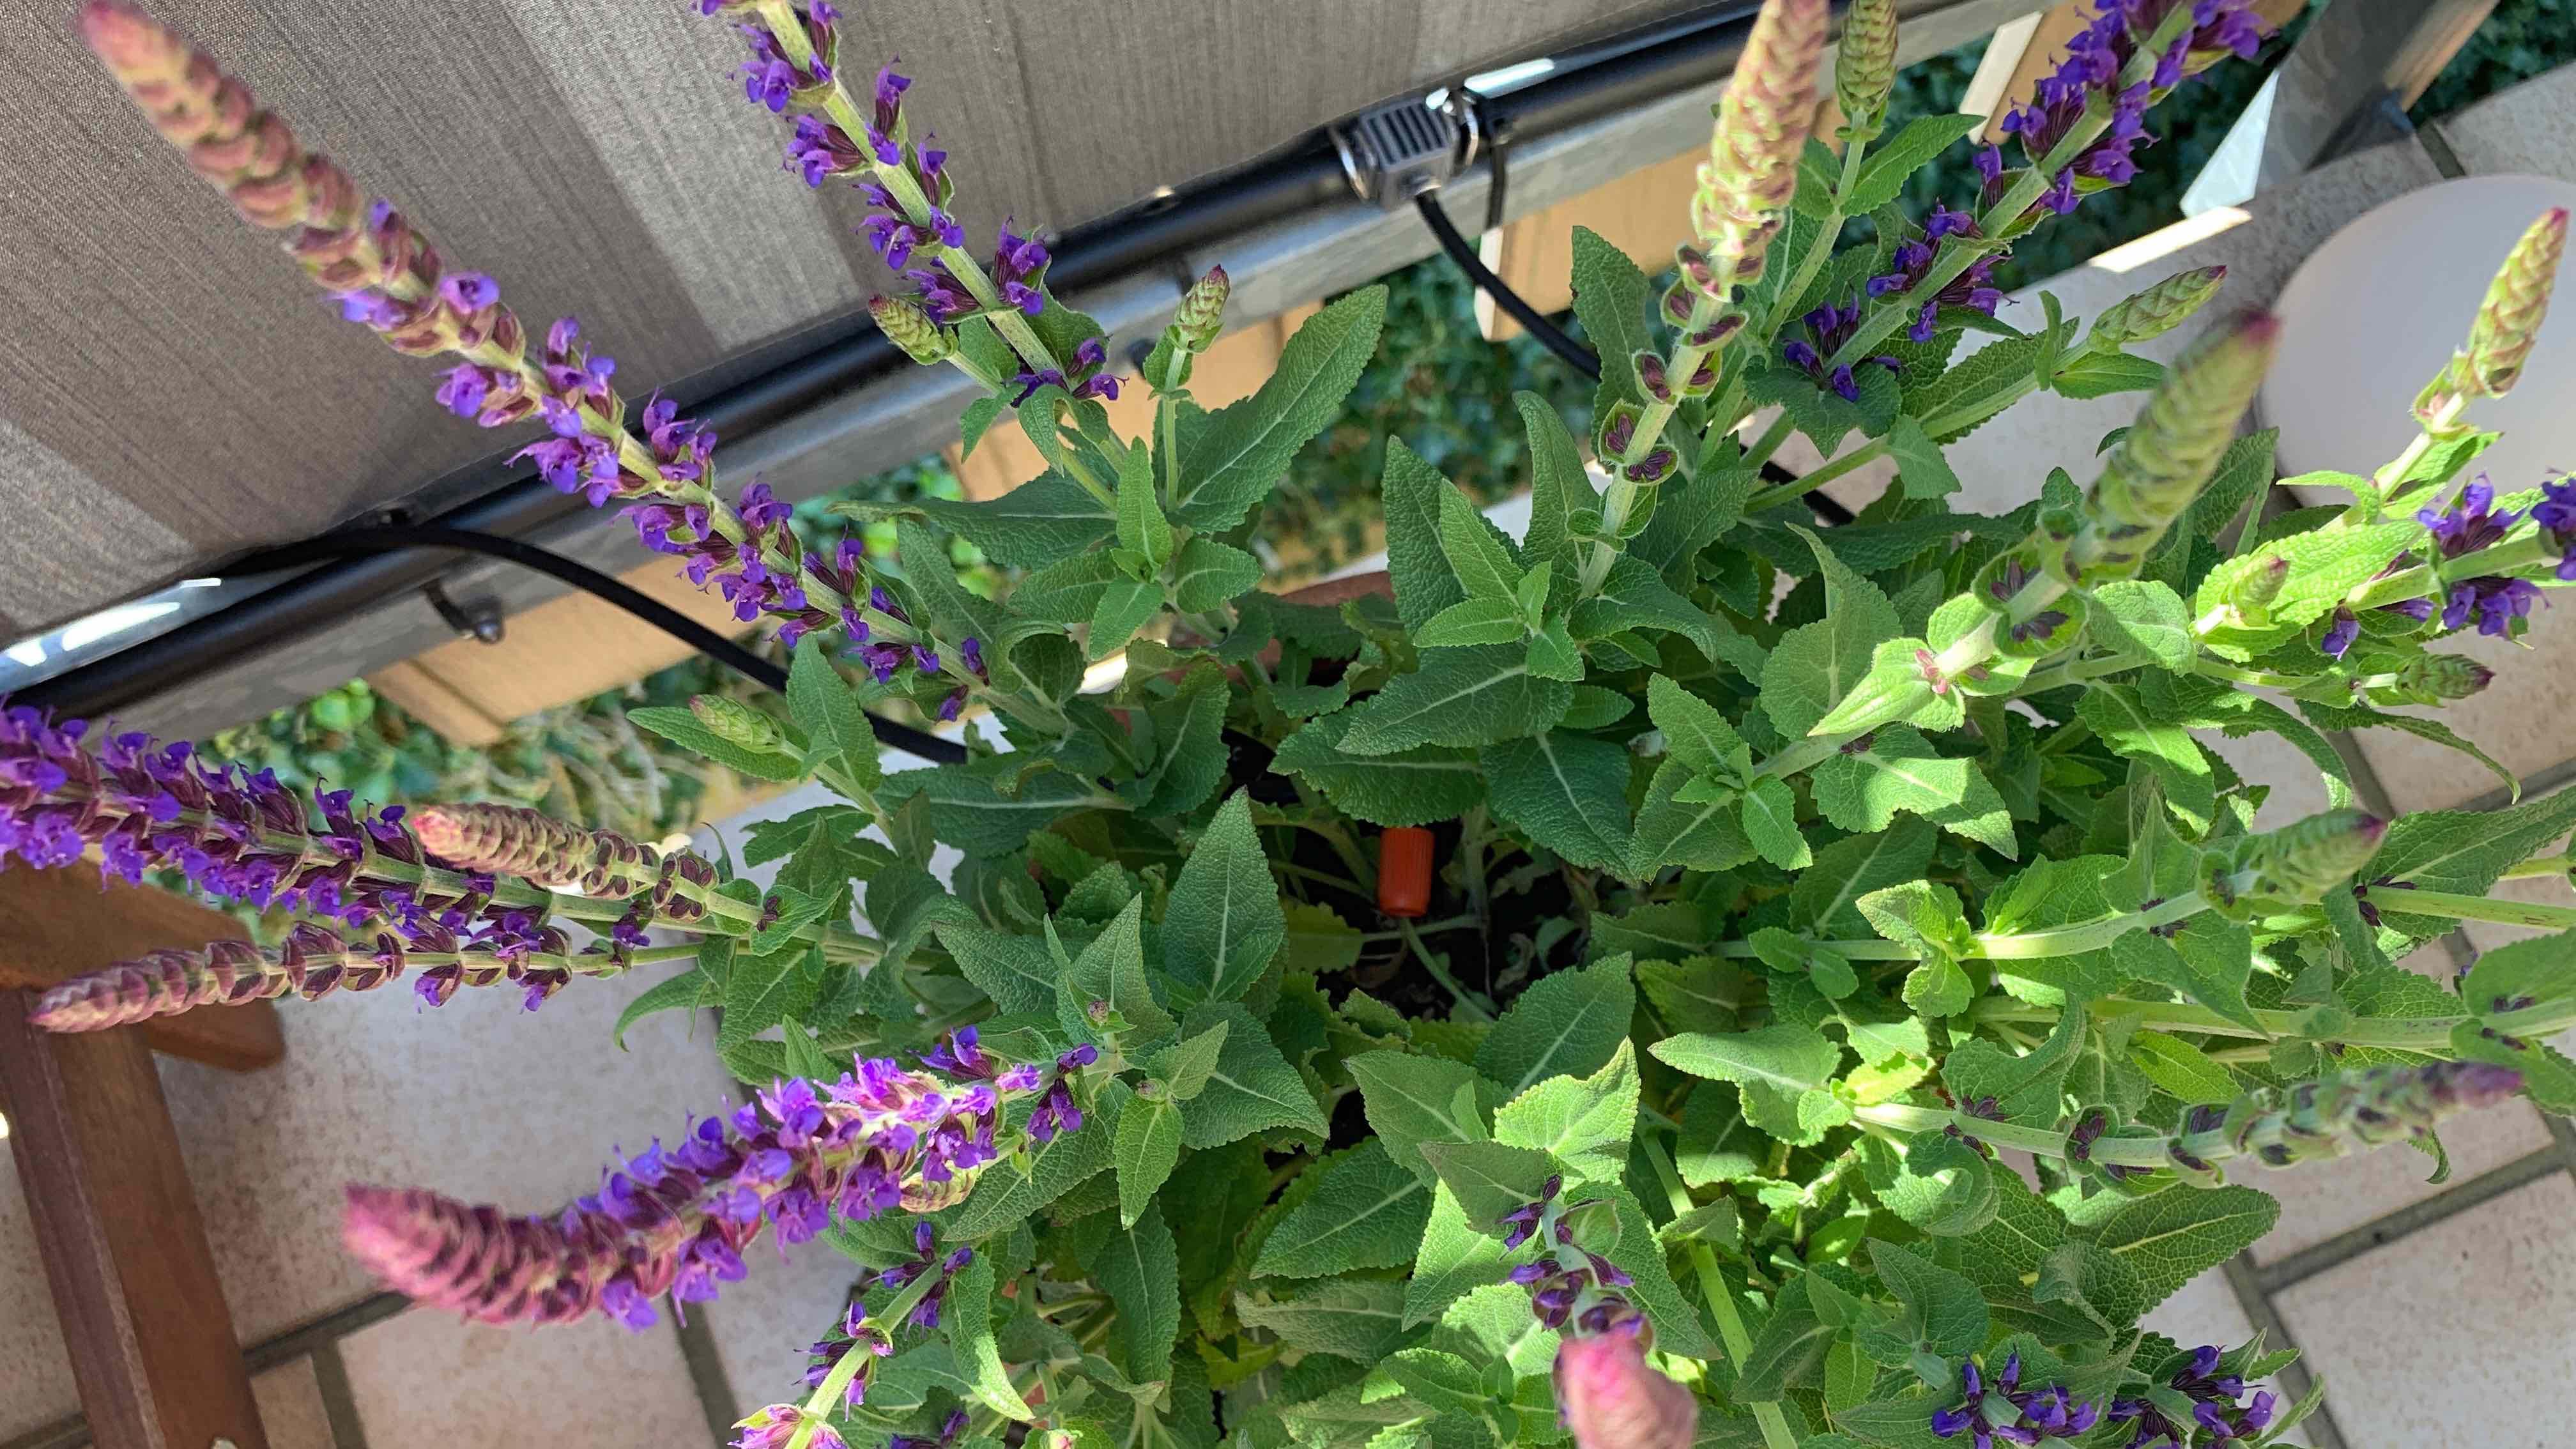 Eve_Aqua_HomeKit_Gardena_Terrasse_Balkon_Pflanzen_Bewässerung3 Wie HomeKit deine Pflanzen auf Balkon/Terrasse automatisiert bewässert